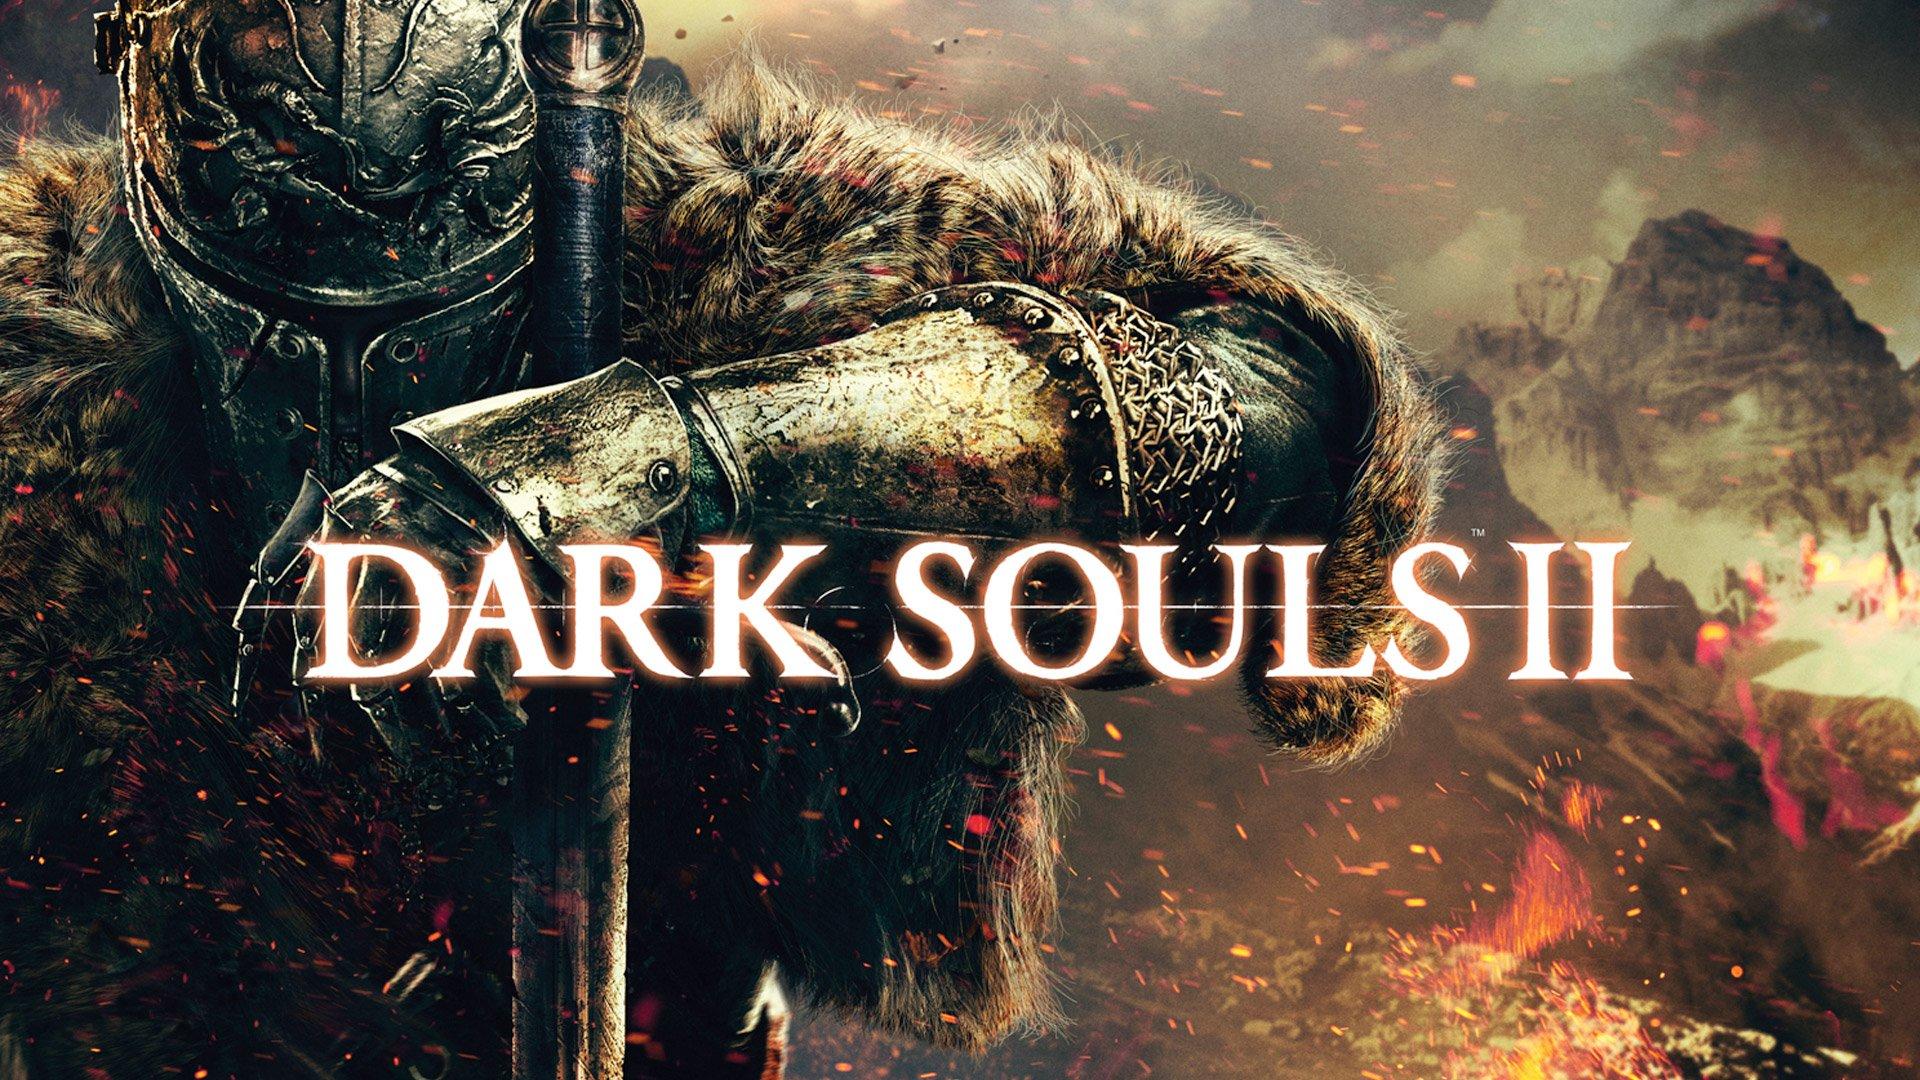 Free Download Dark Souls Ii Wallpaper In 1920x1080 1920x1080 For